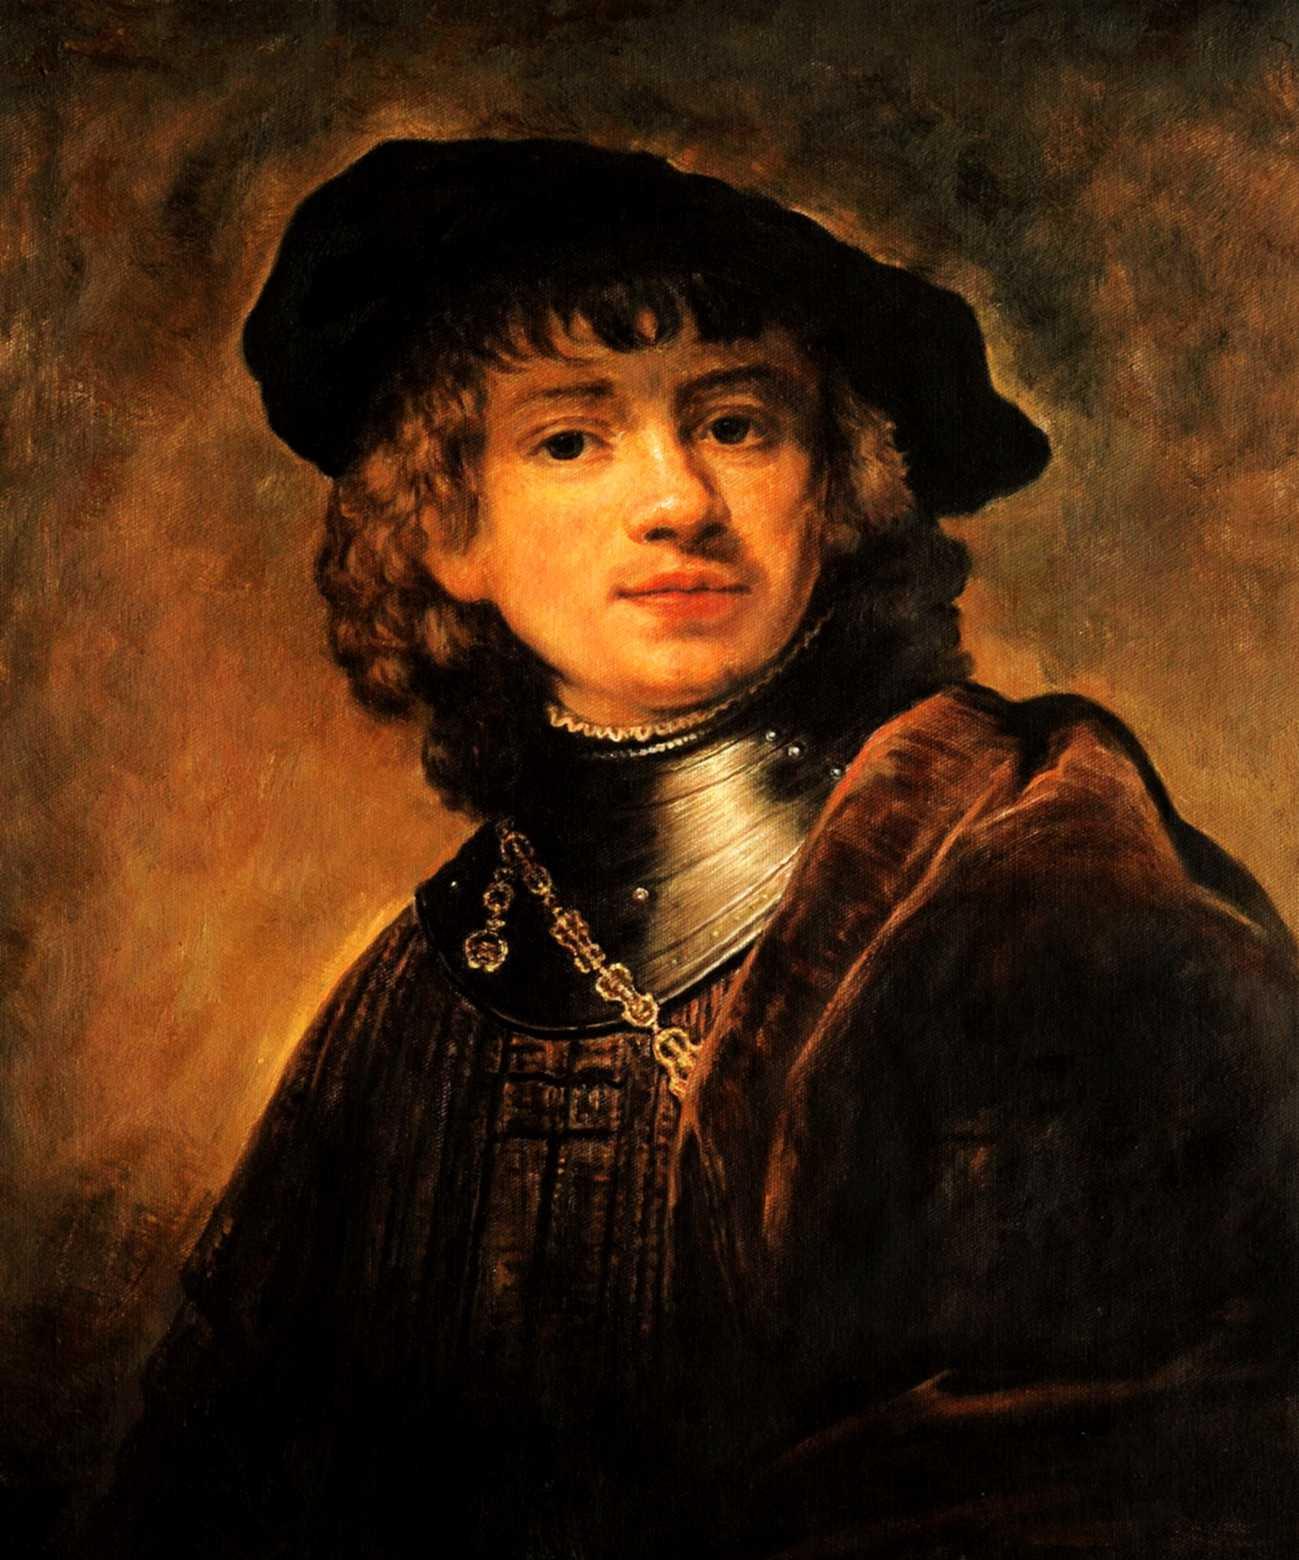 Rembrandt - Selbstportrait als junger Mann c95343 50x60cm exzellentes Ölgemälde Museumsqualität